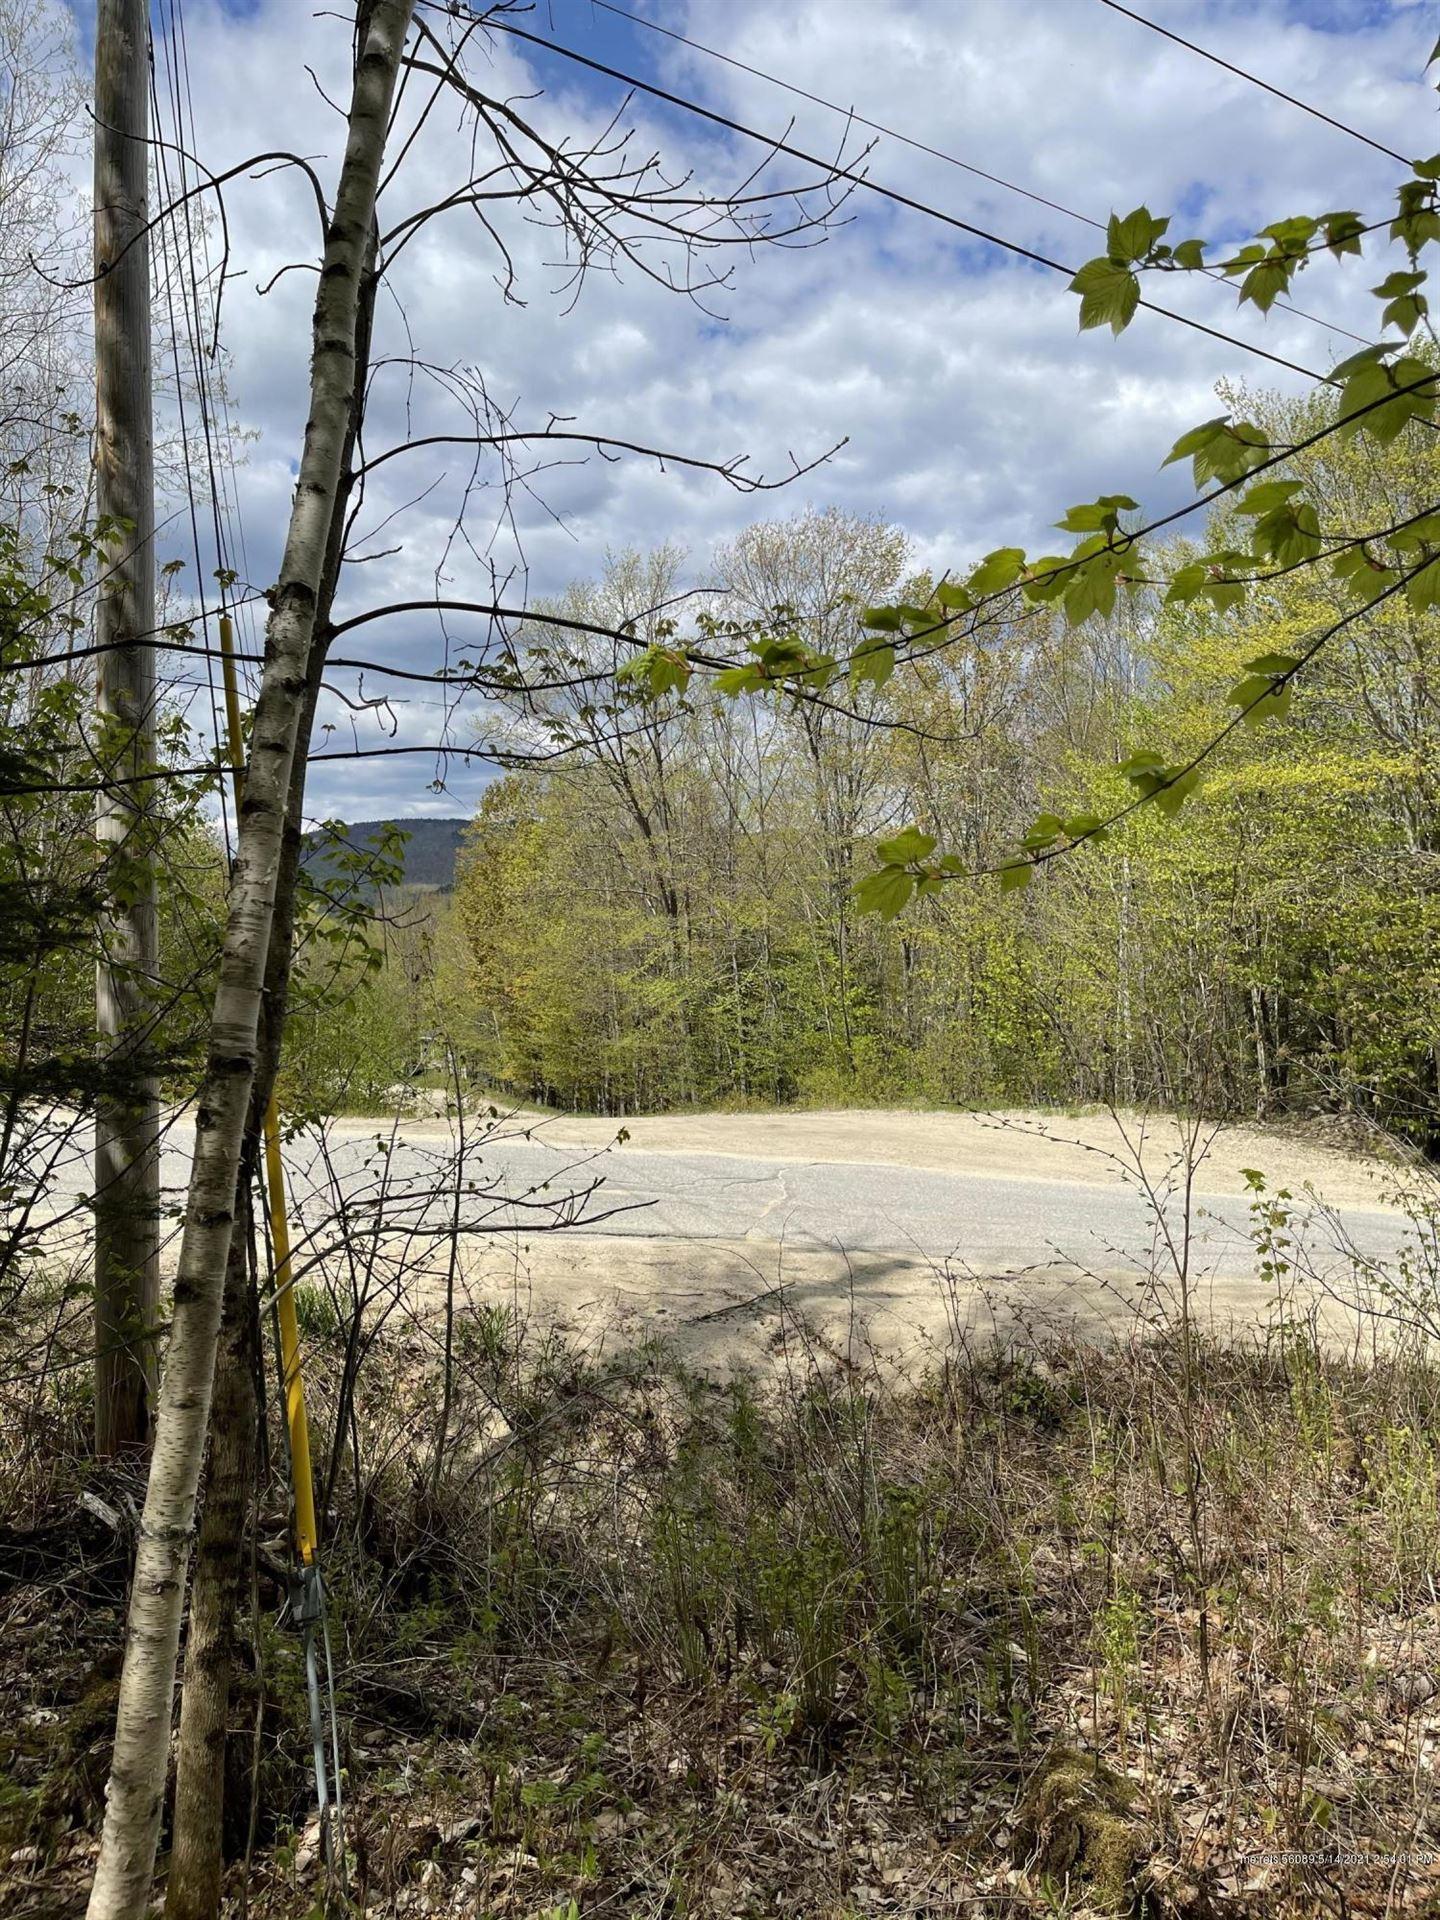 Photo of 00 Fields Hill Road, Sumner, ME 04292 (MLS # 1491710)